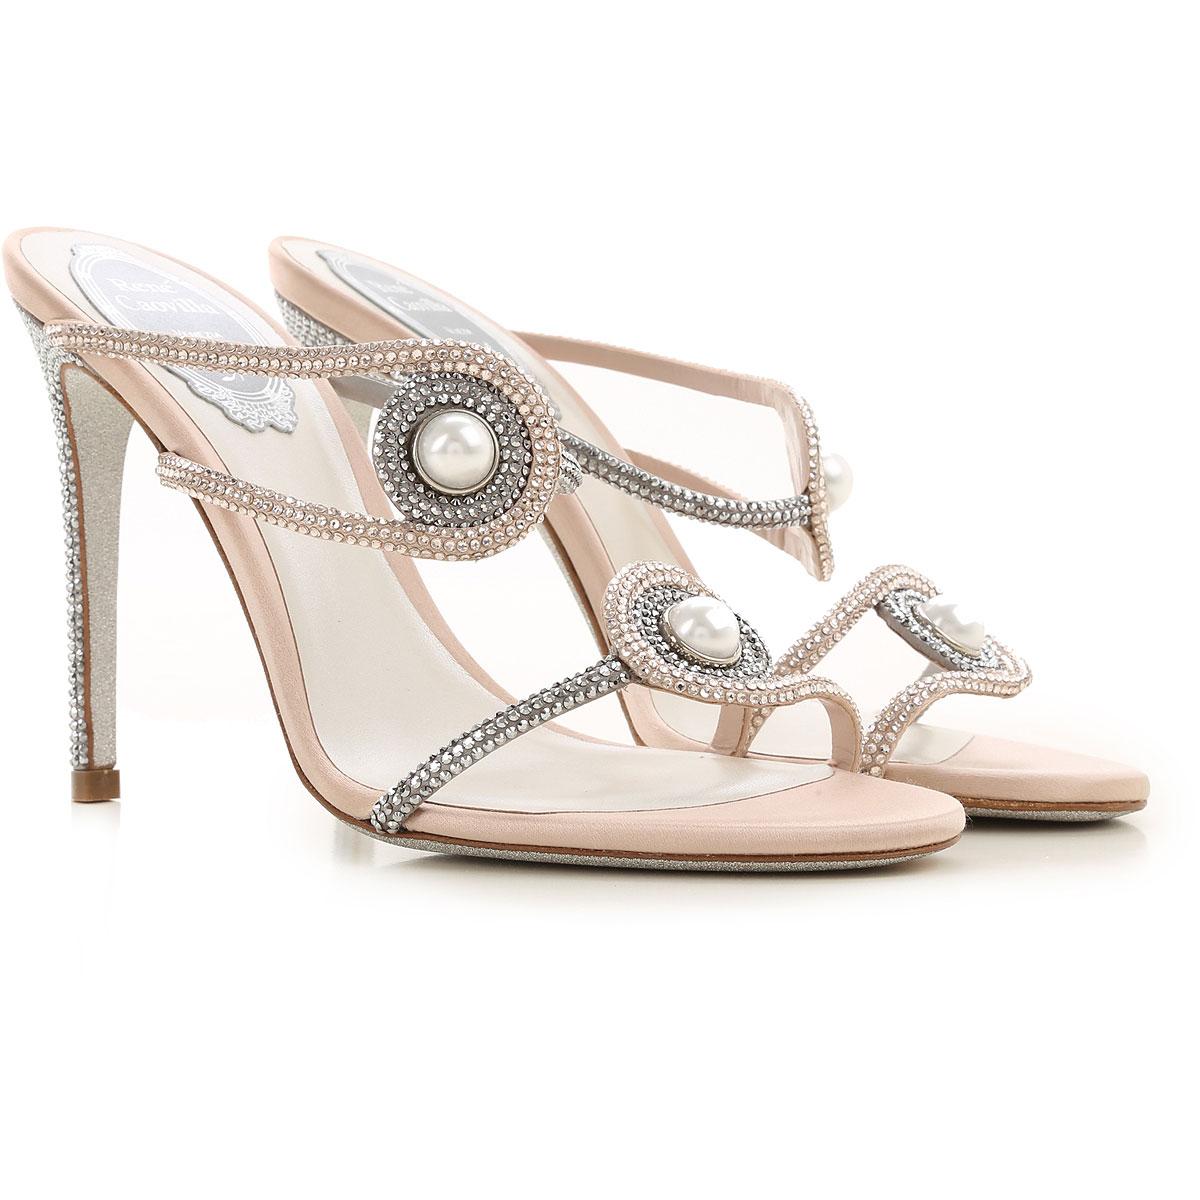 Rene Caovilla Sandals for Women On Sale, Powder Rose, satin, 2019, 10 7 8 8.5 9